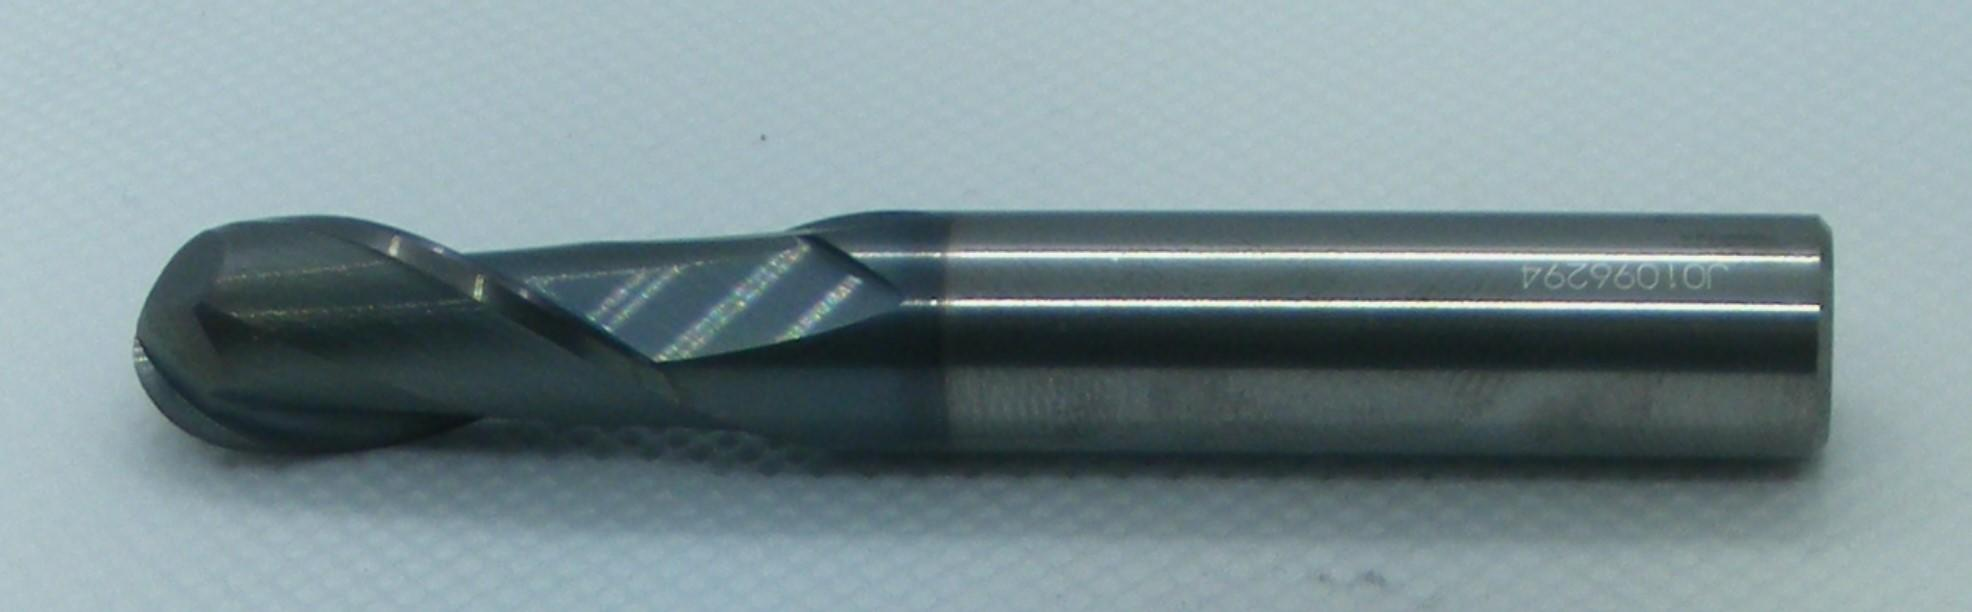 10mm Carbide Endmill 2 Flute Ballnose Long TiAlN